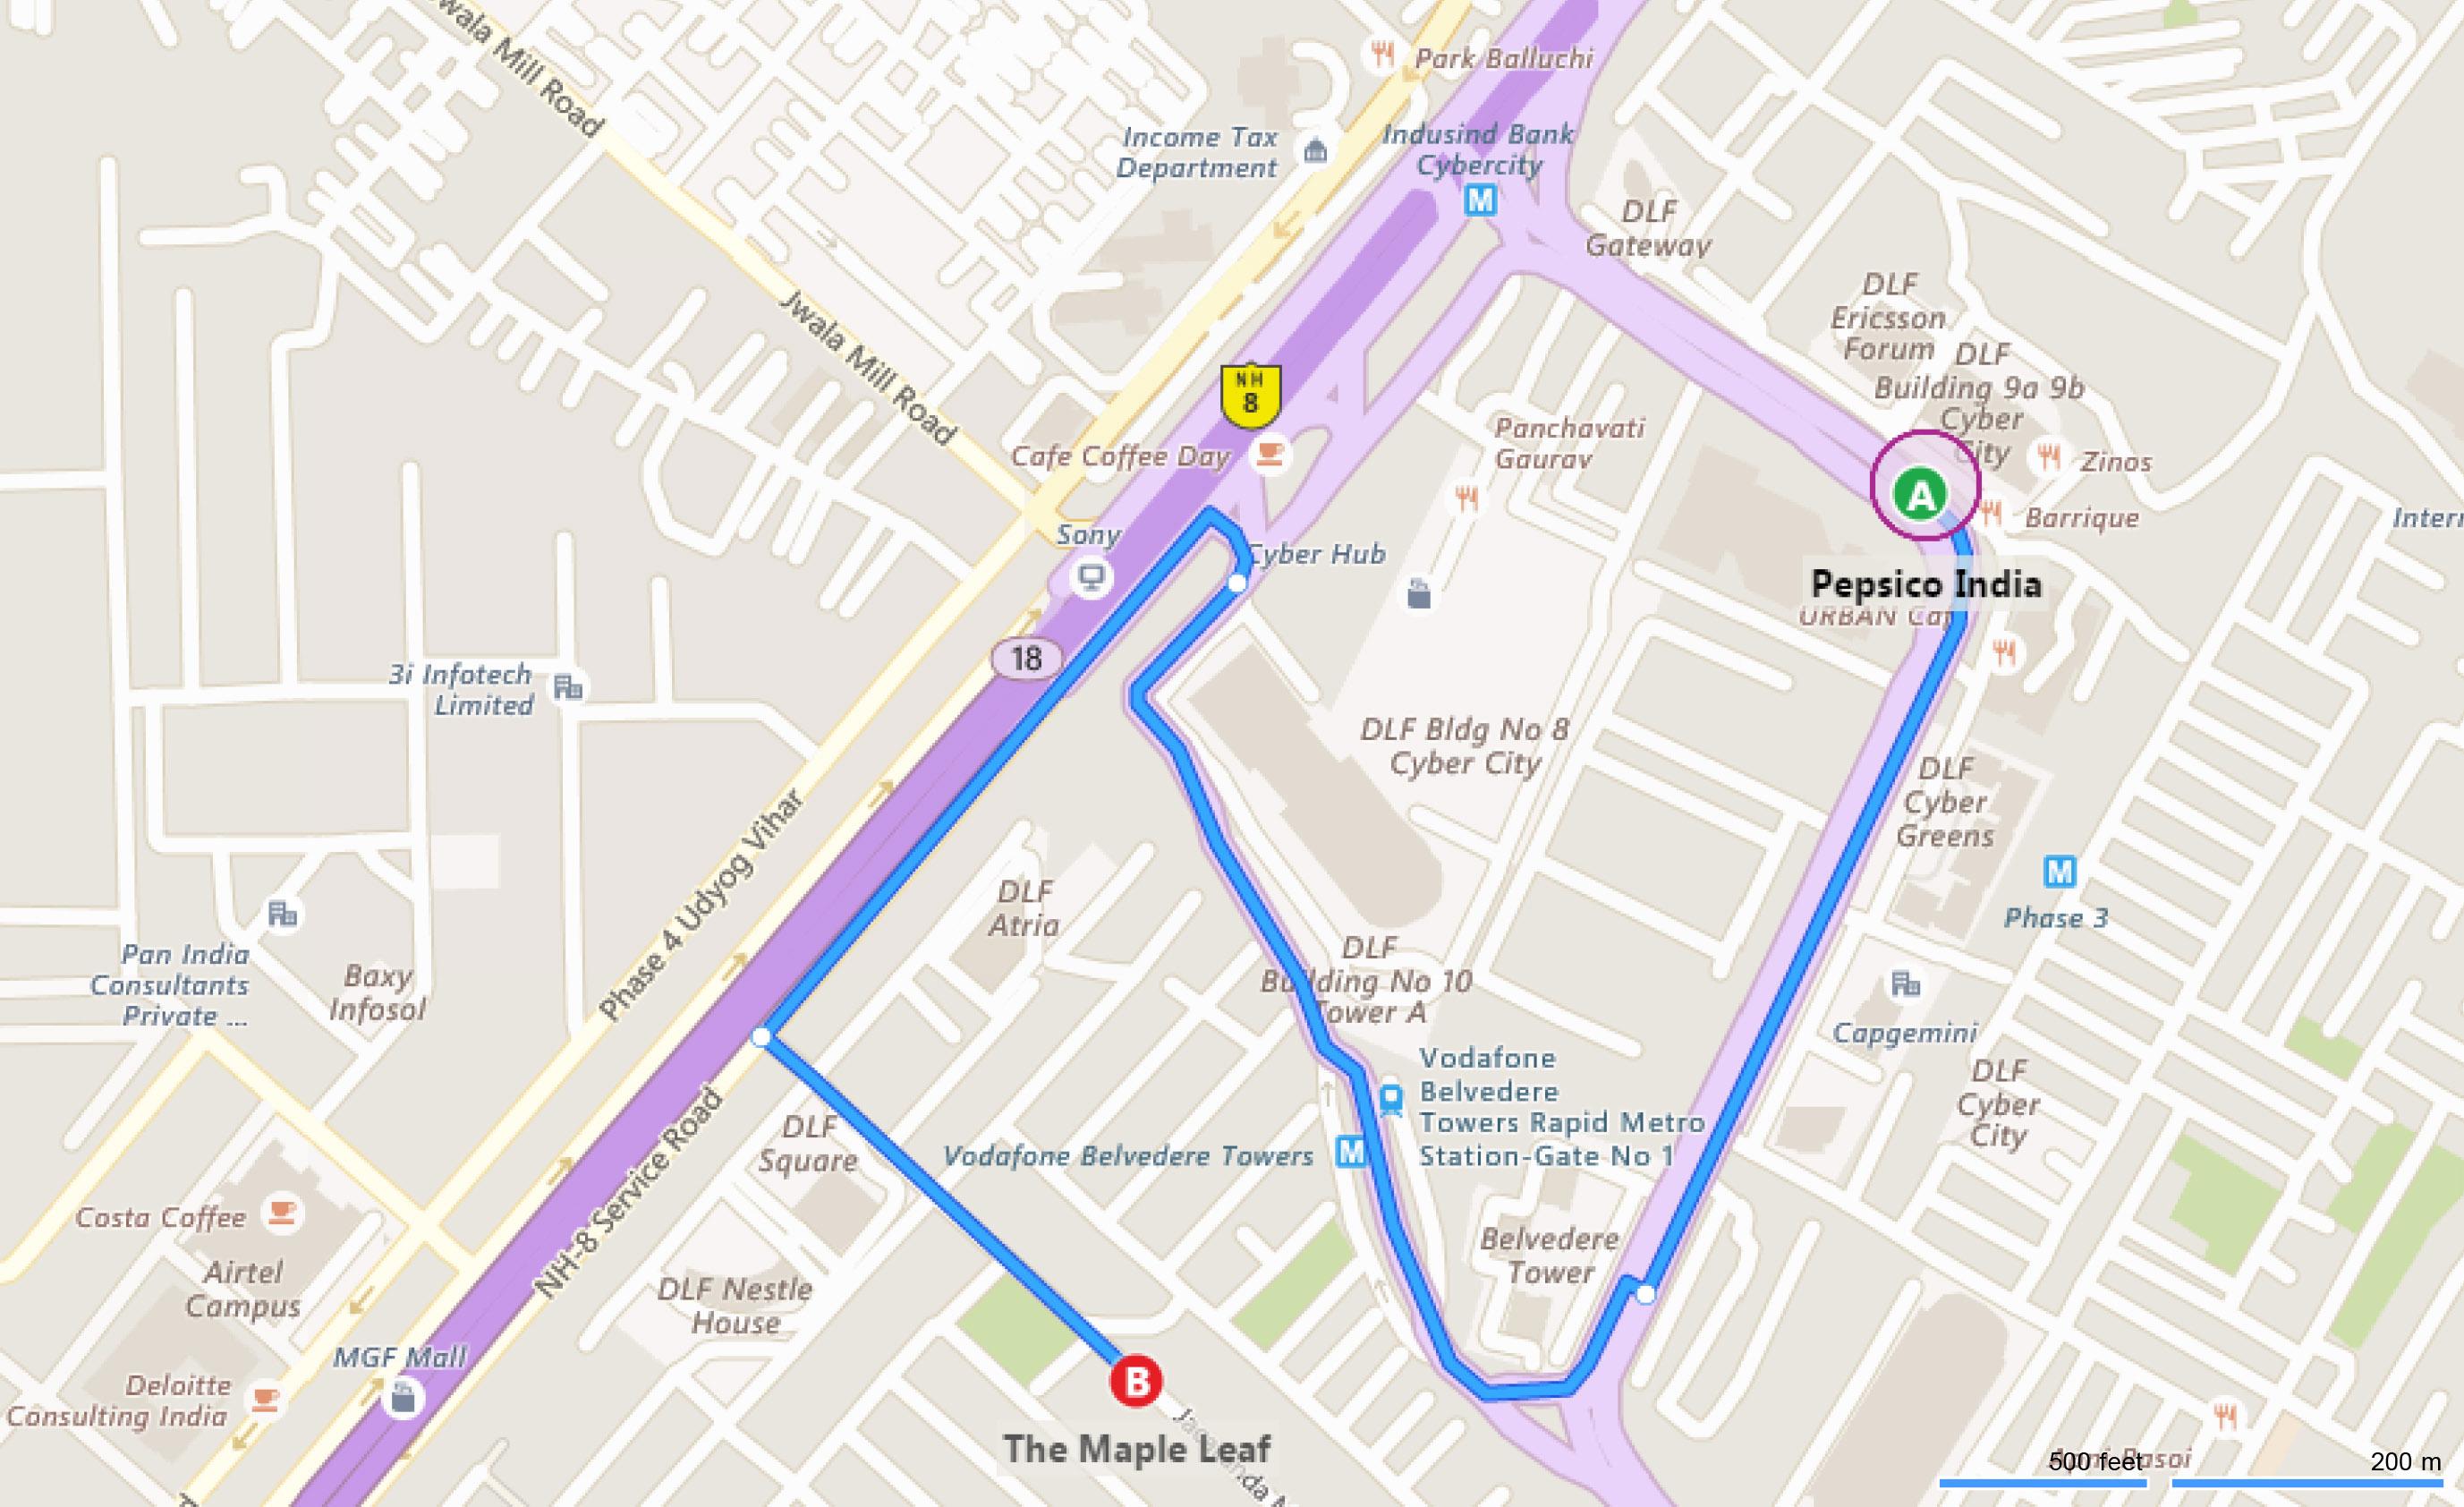 Budget Hotel Near PepsiCo Office Gurgaon | Budget Hotels in DLF ...